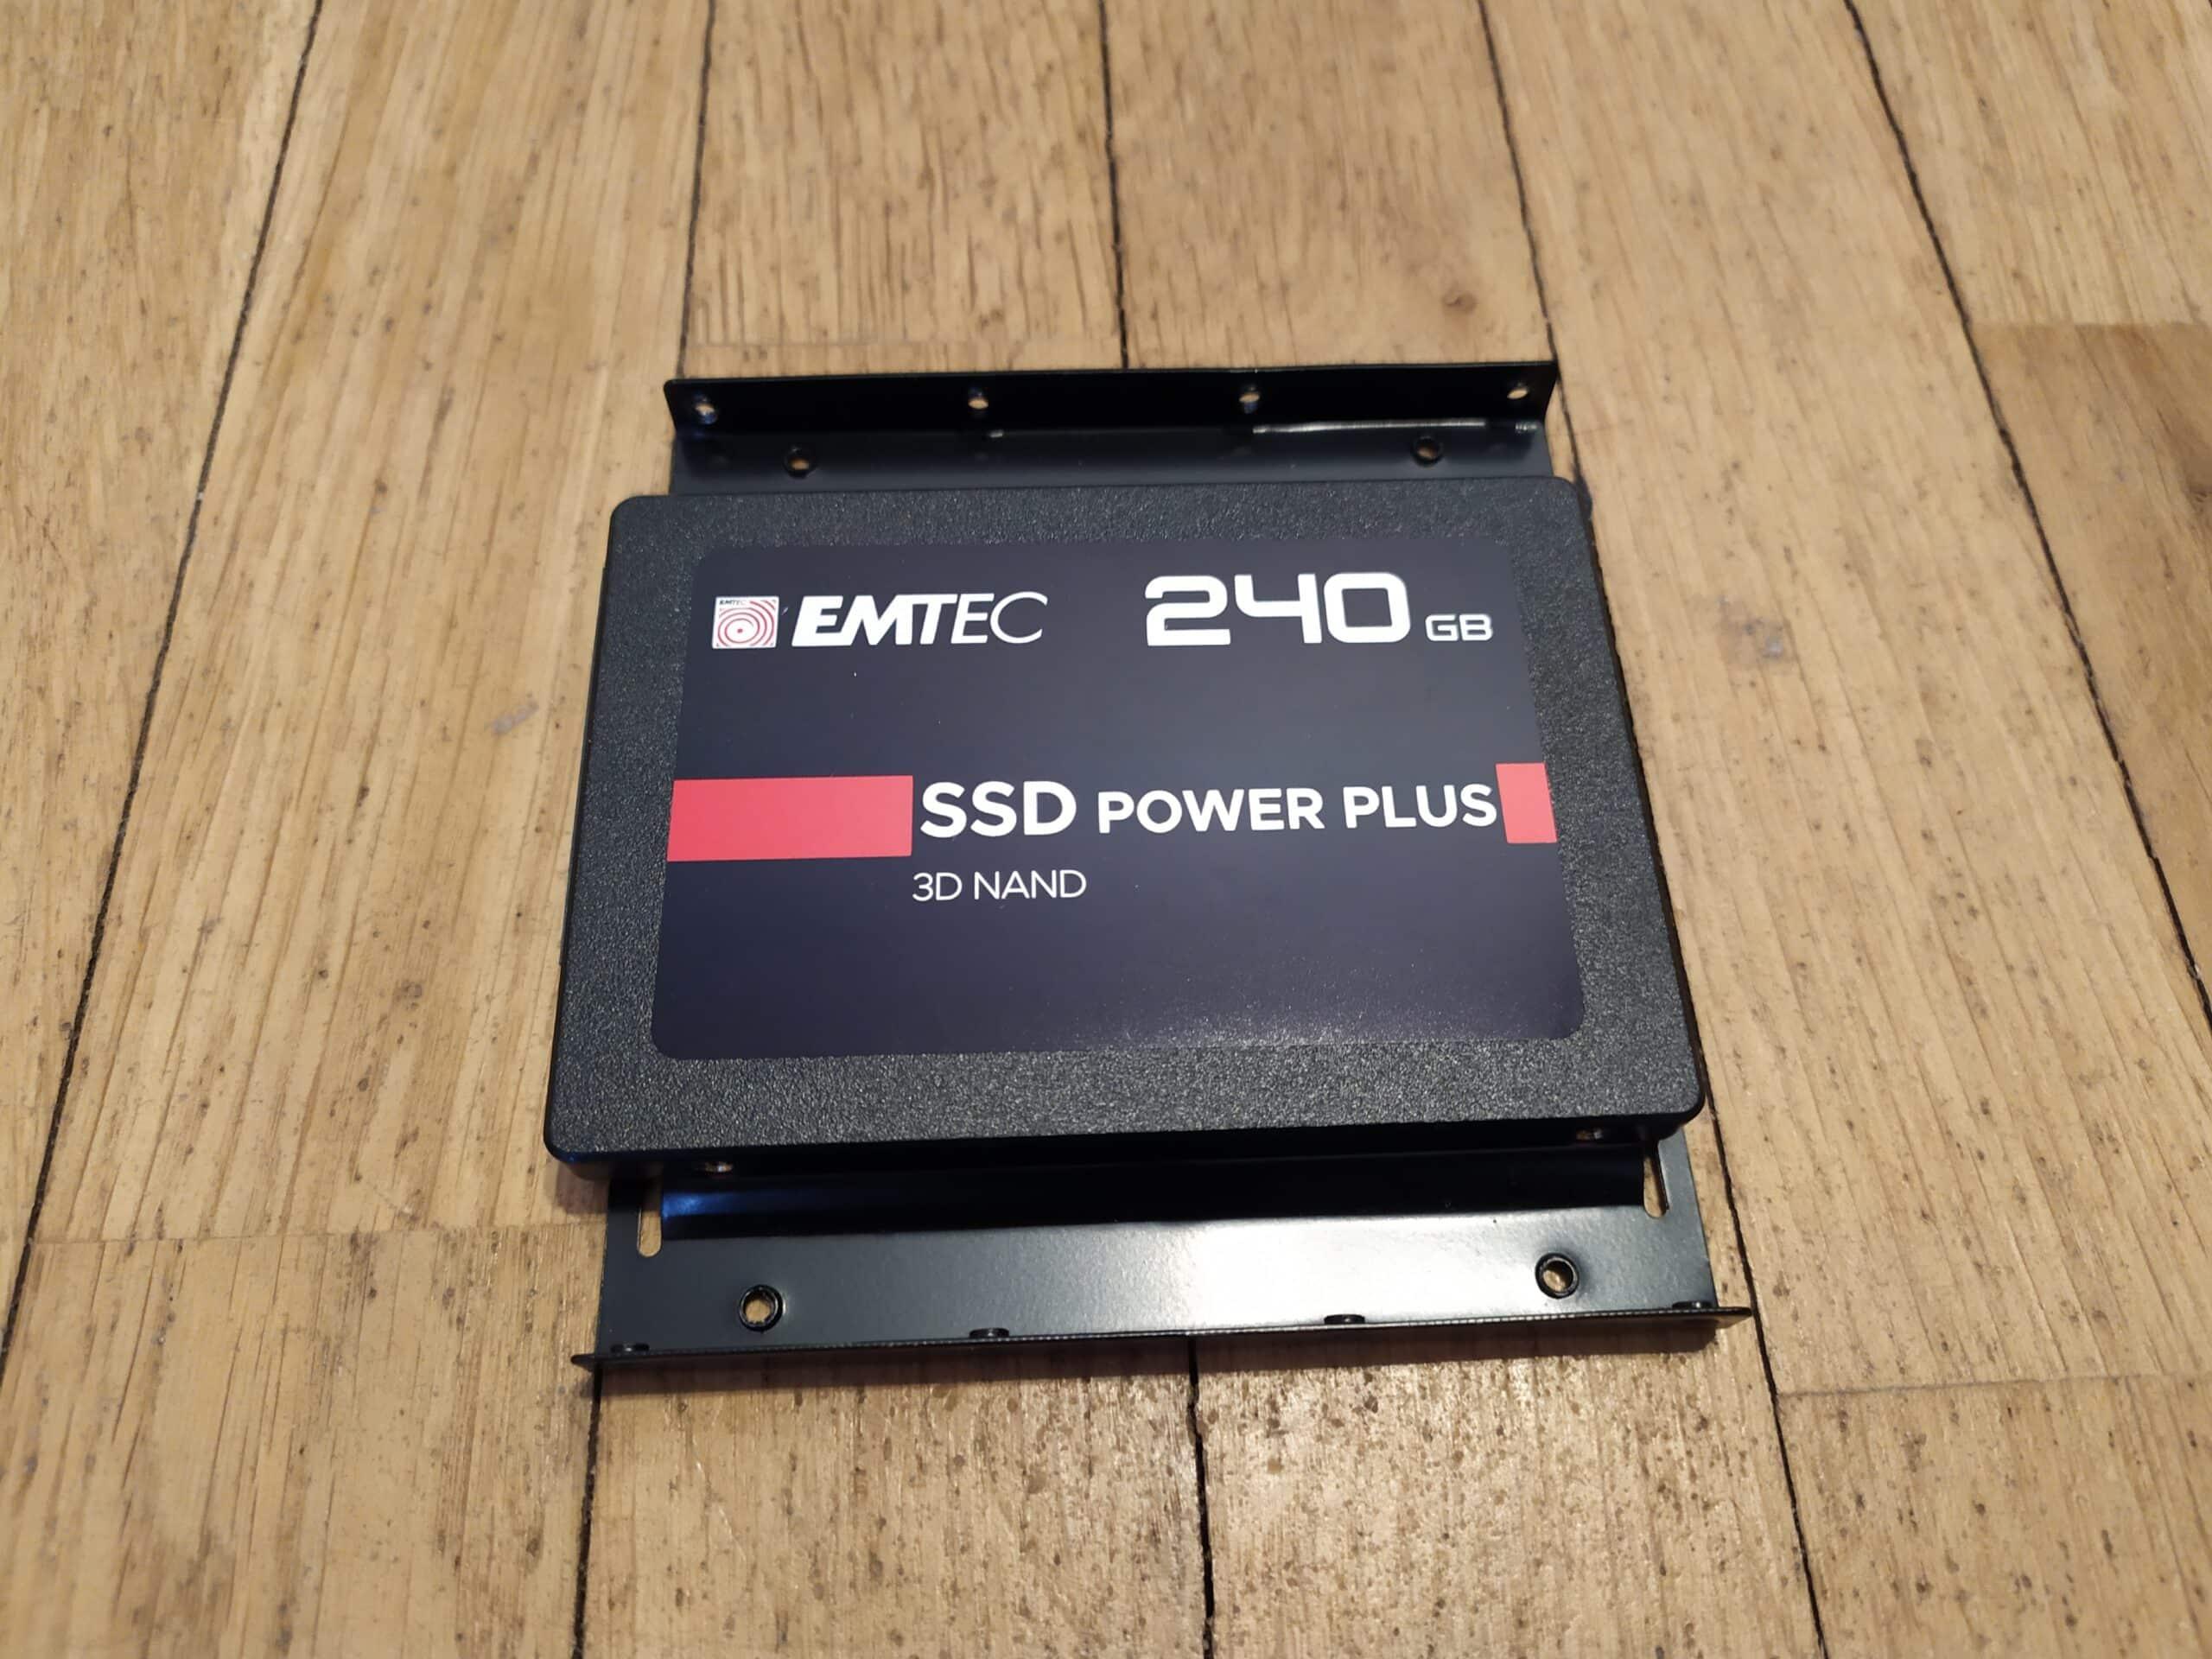 EMTEC SSD Power Plus 3D NAND 240 GB